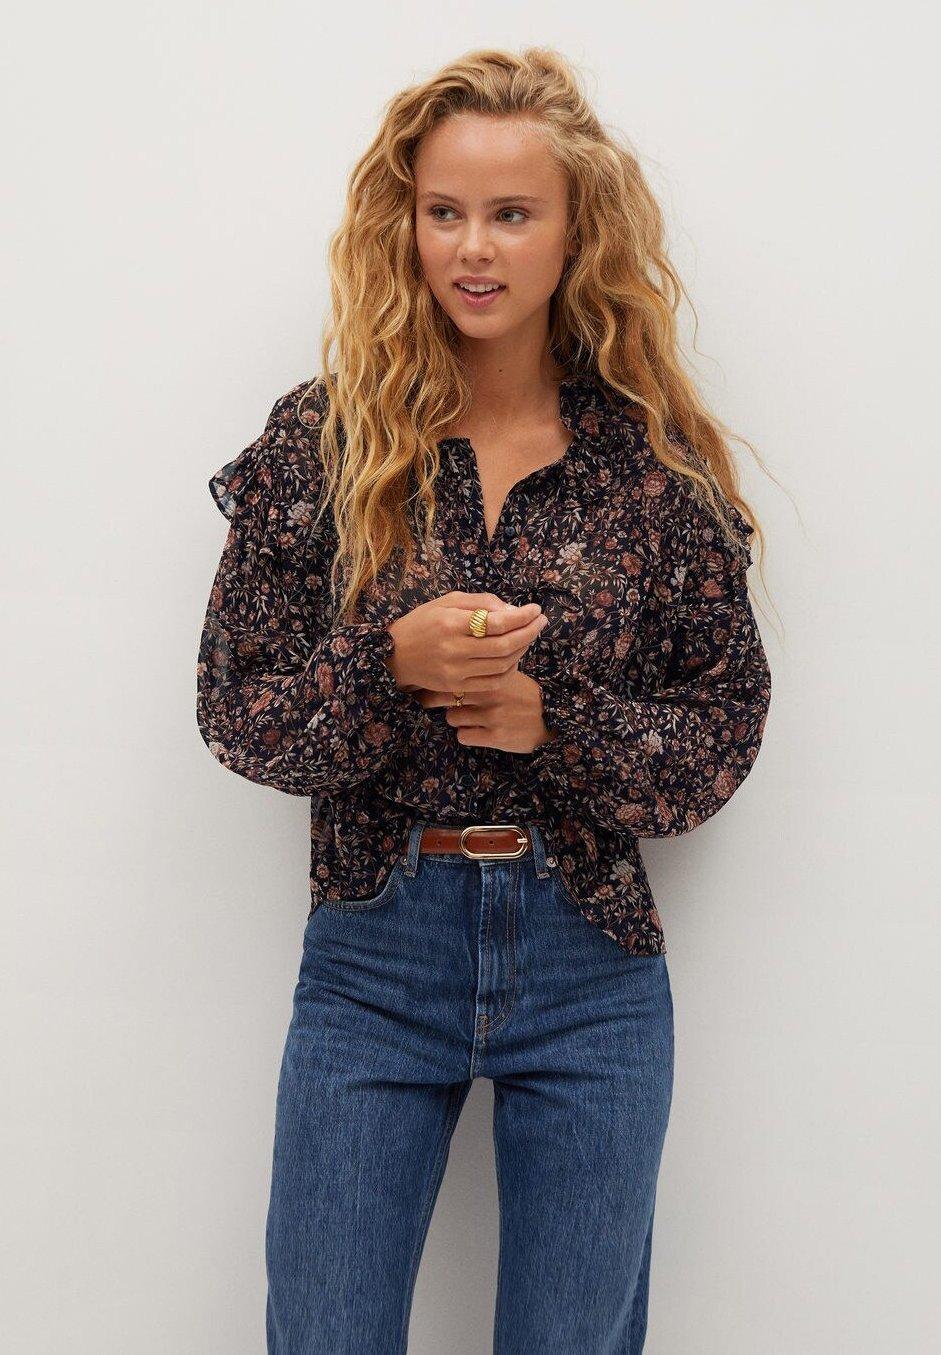 Blusar & skjortor | Dam | Köp blusar & skjortor online på